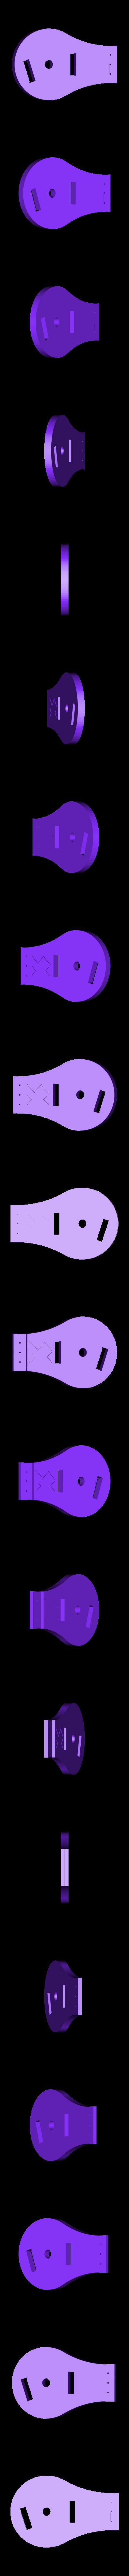 BB_Frame_PRINTx4.stl Download free STL file Ballista Bow V1 • 3D printing design, Snorri